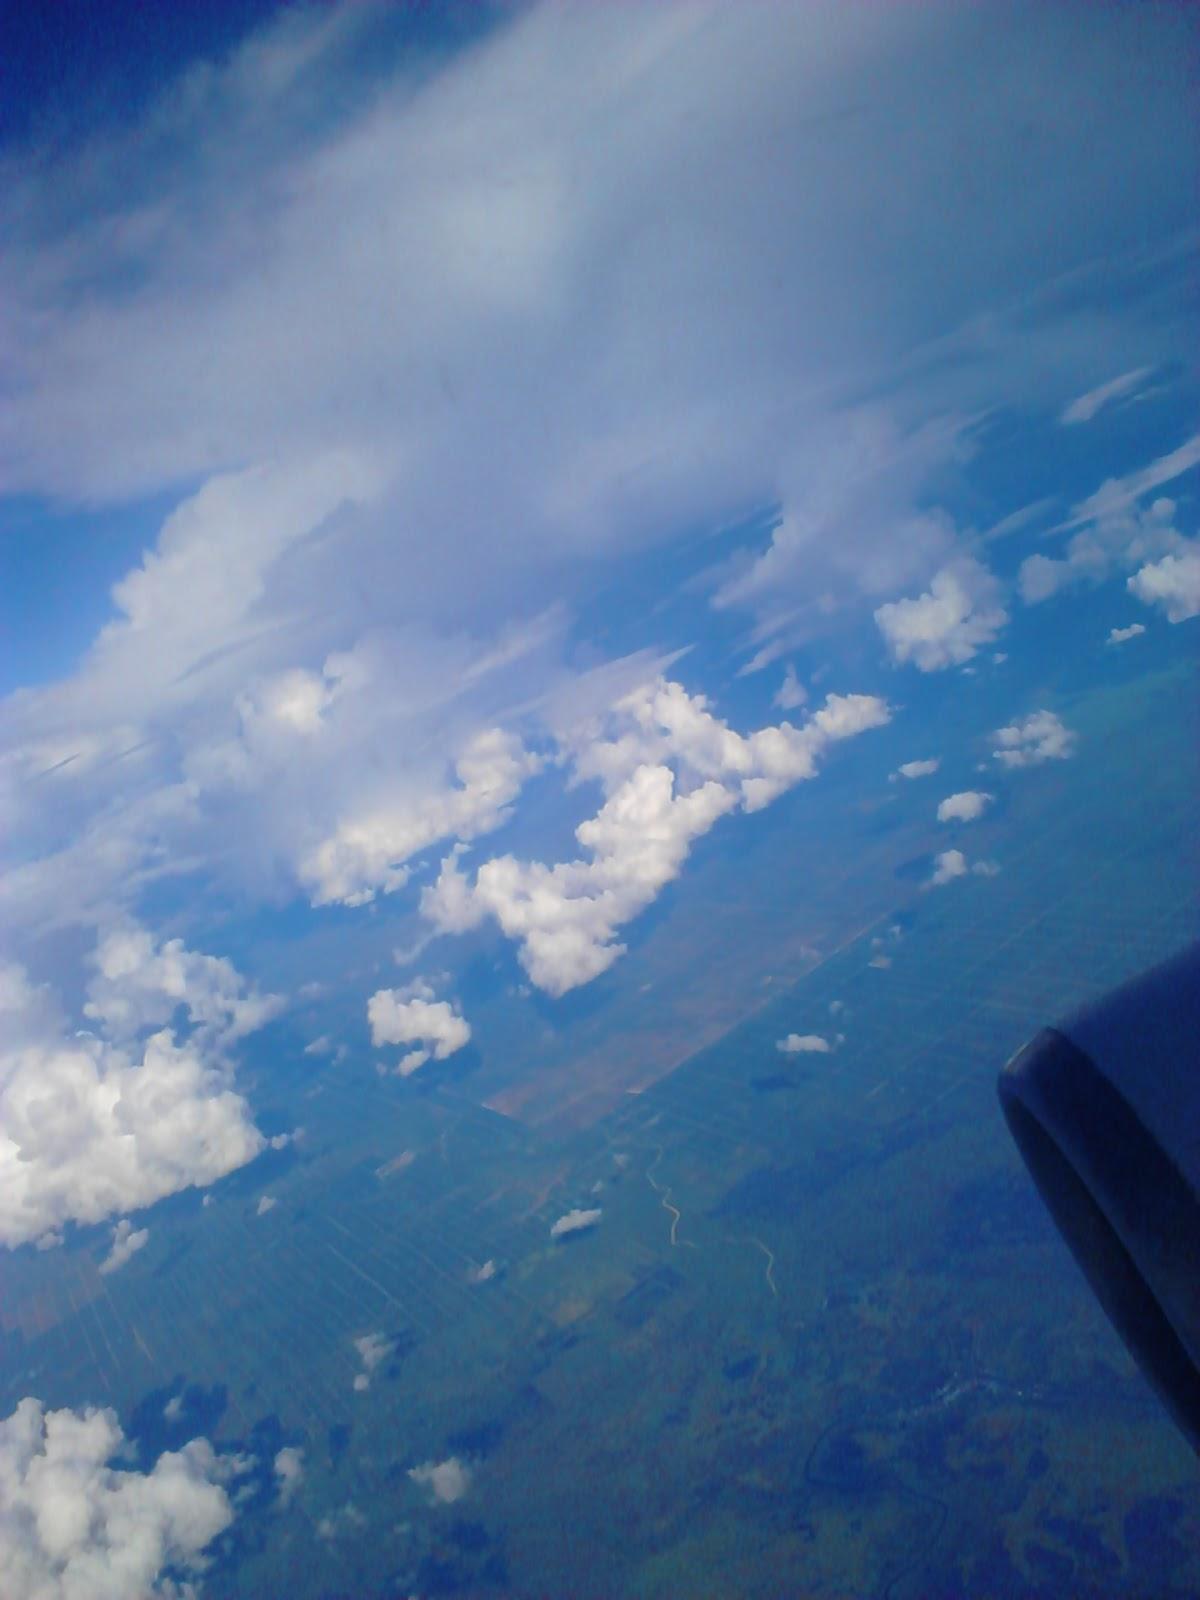 Foto Dalam Pesawat Awan Dari Dalam Pesawat